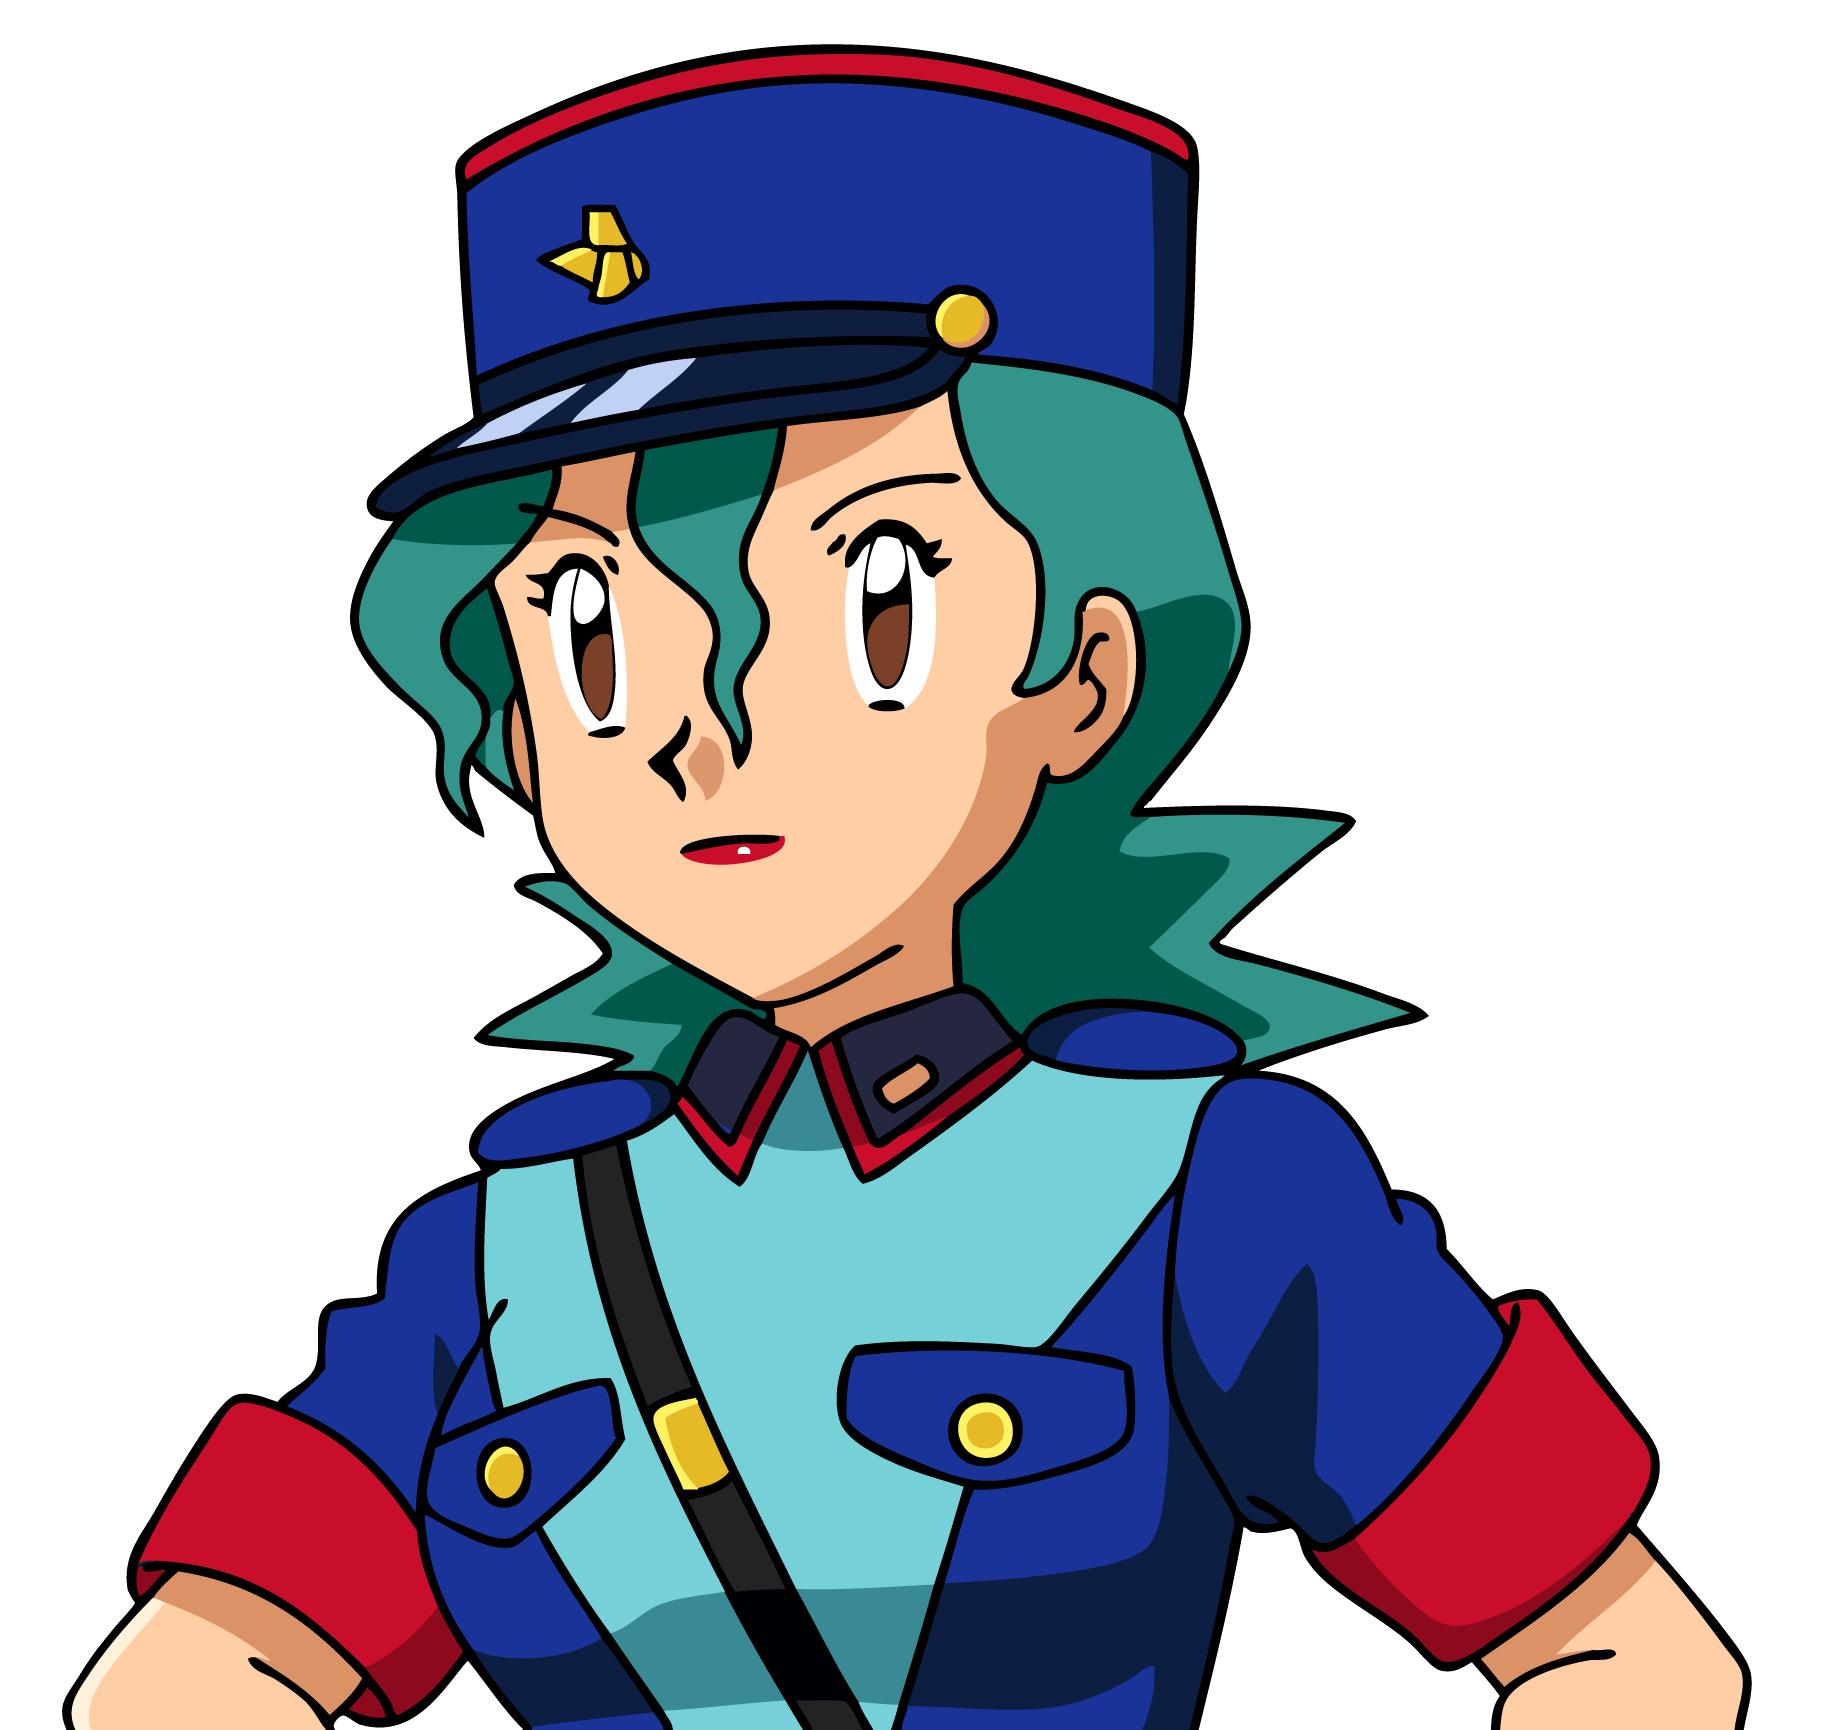 Pokemon X And Y Anime - Officer Jenny by Animemissy123 on DeviantArt